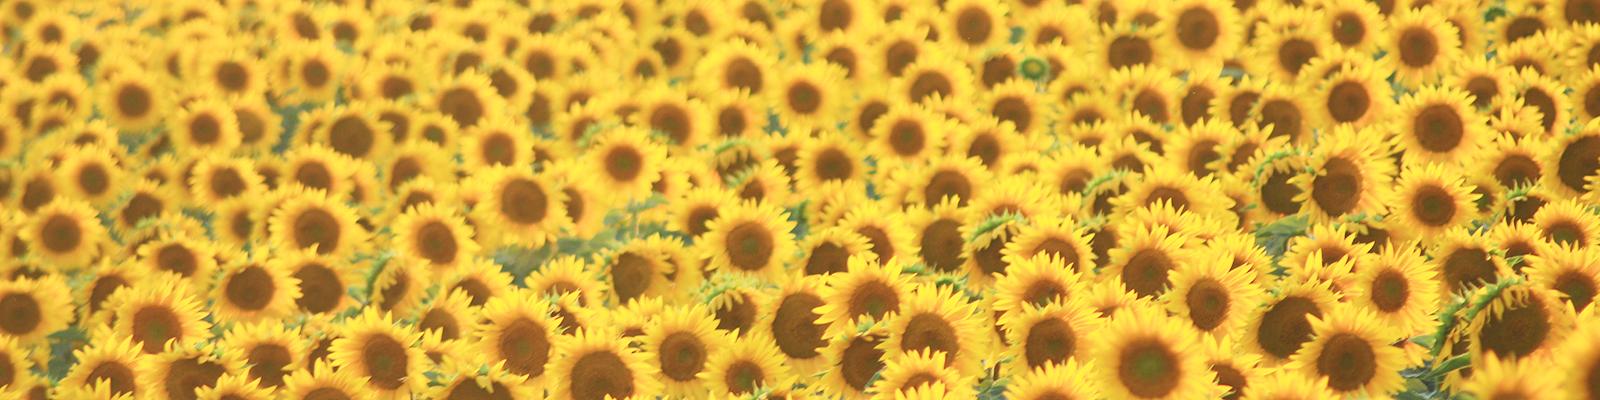 Photo of field of sunflowers